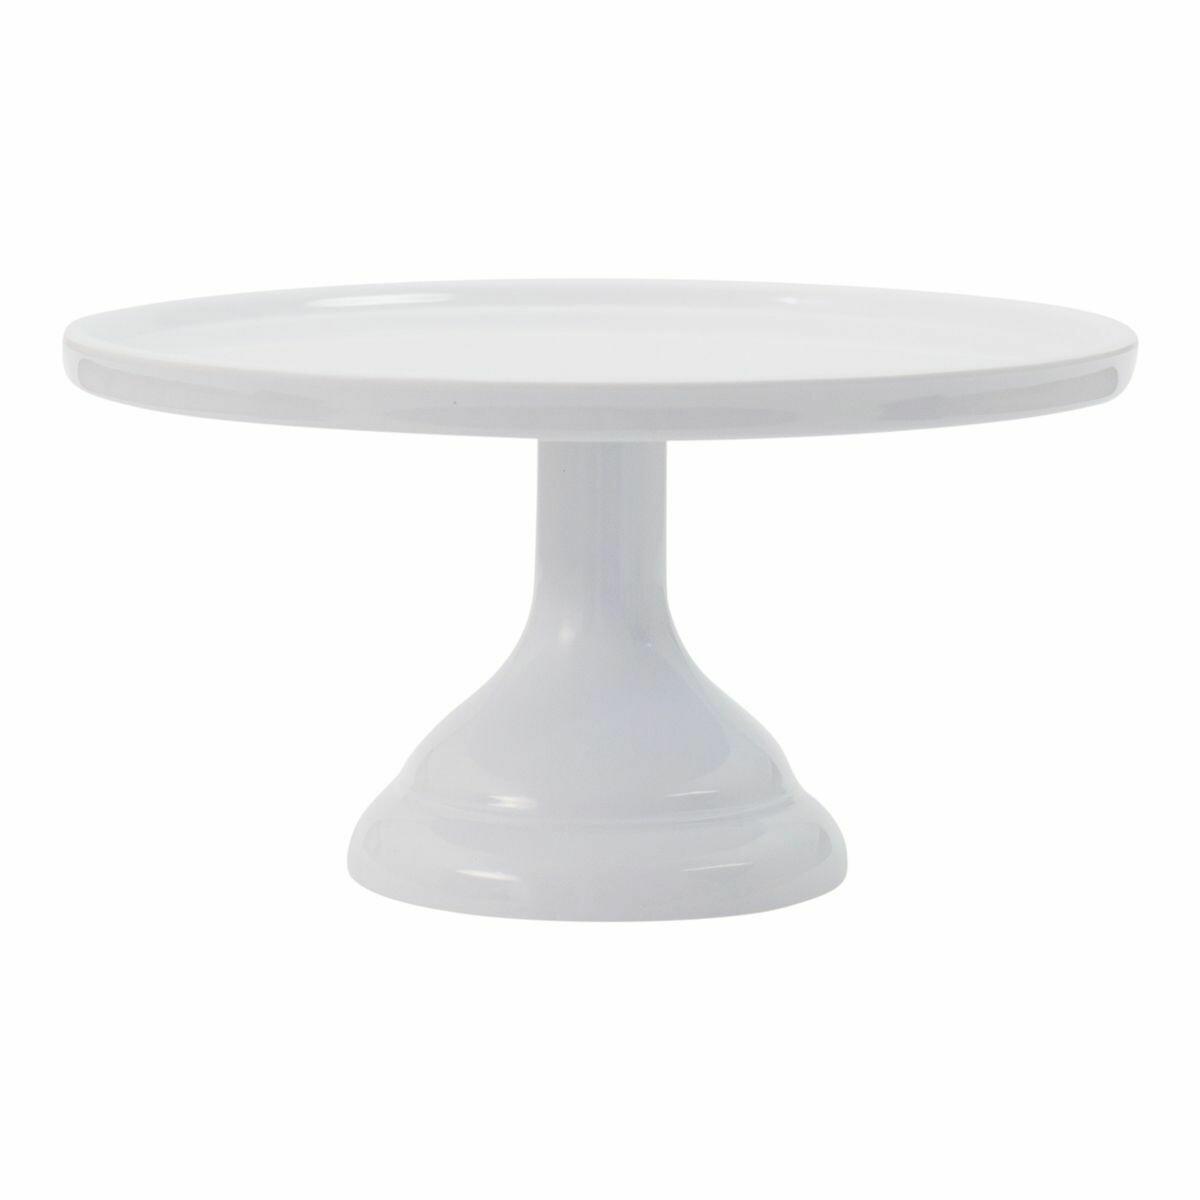 Melamine Cake Stand -SMALL WHITE - Μικρή Βάση Για Τούρτα από Μελαμίνη - Λευκή 24εκ